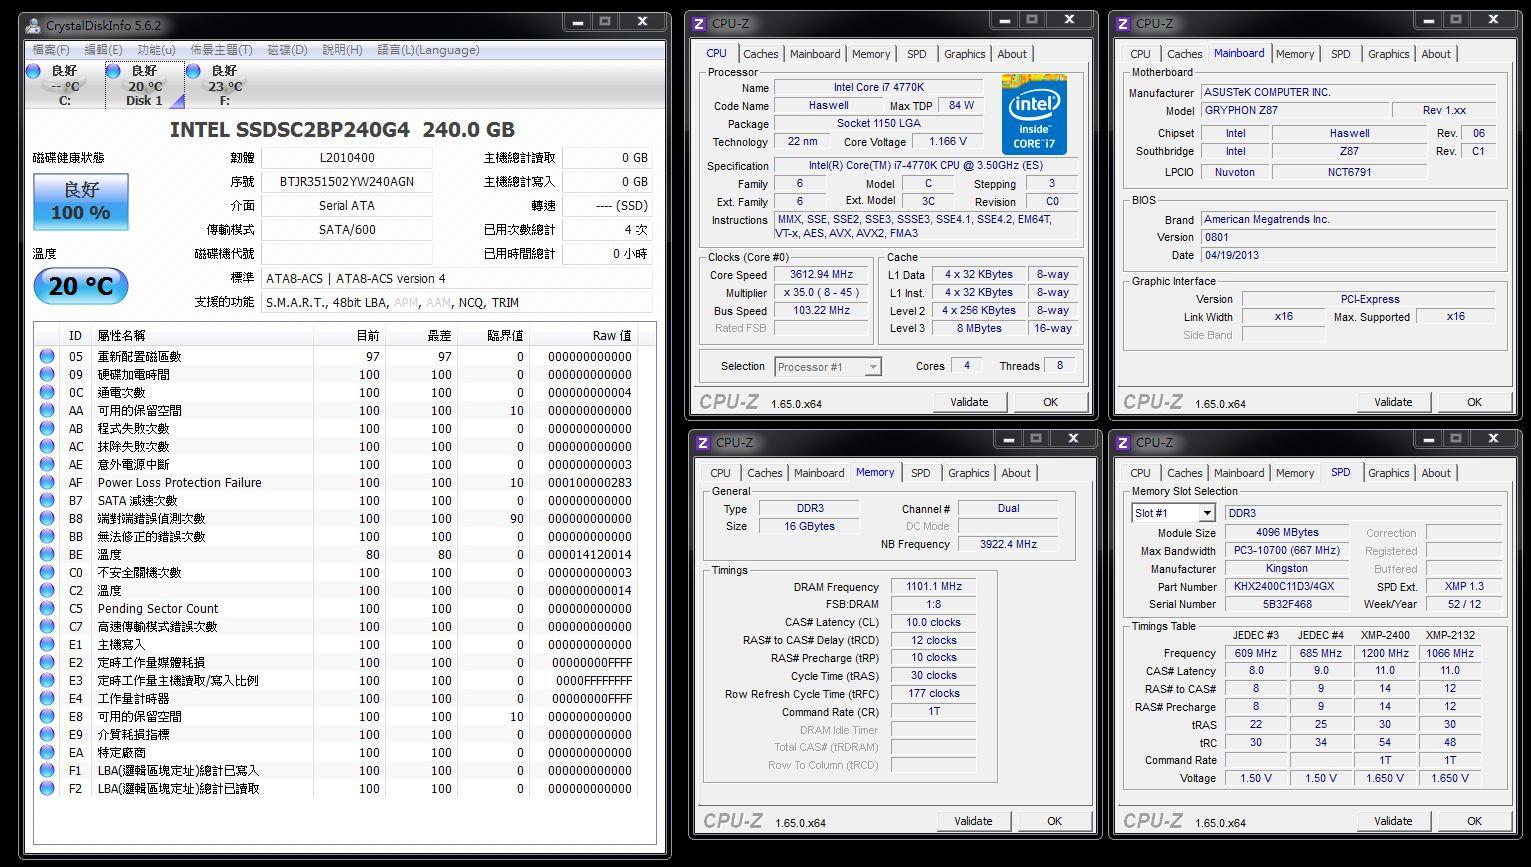 [XF] INTEL SSD 730 240GB測試報告 加映 RAID0 效能測試